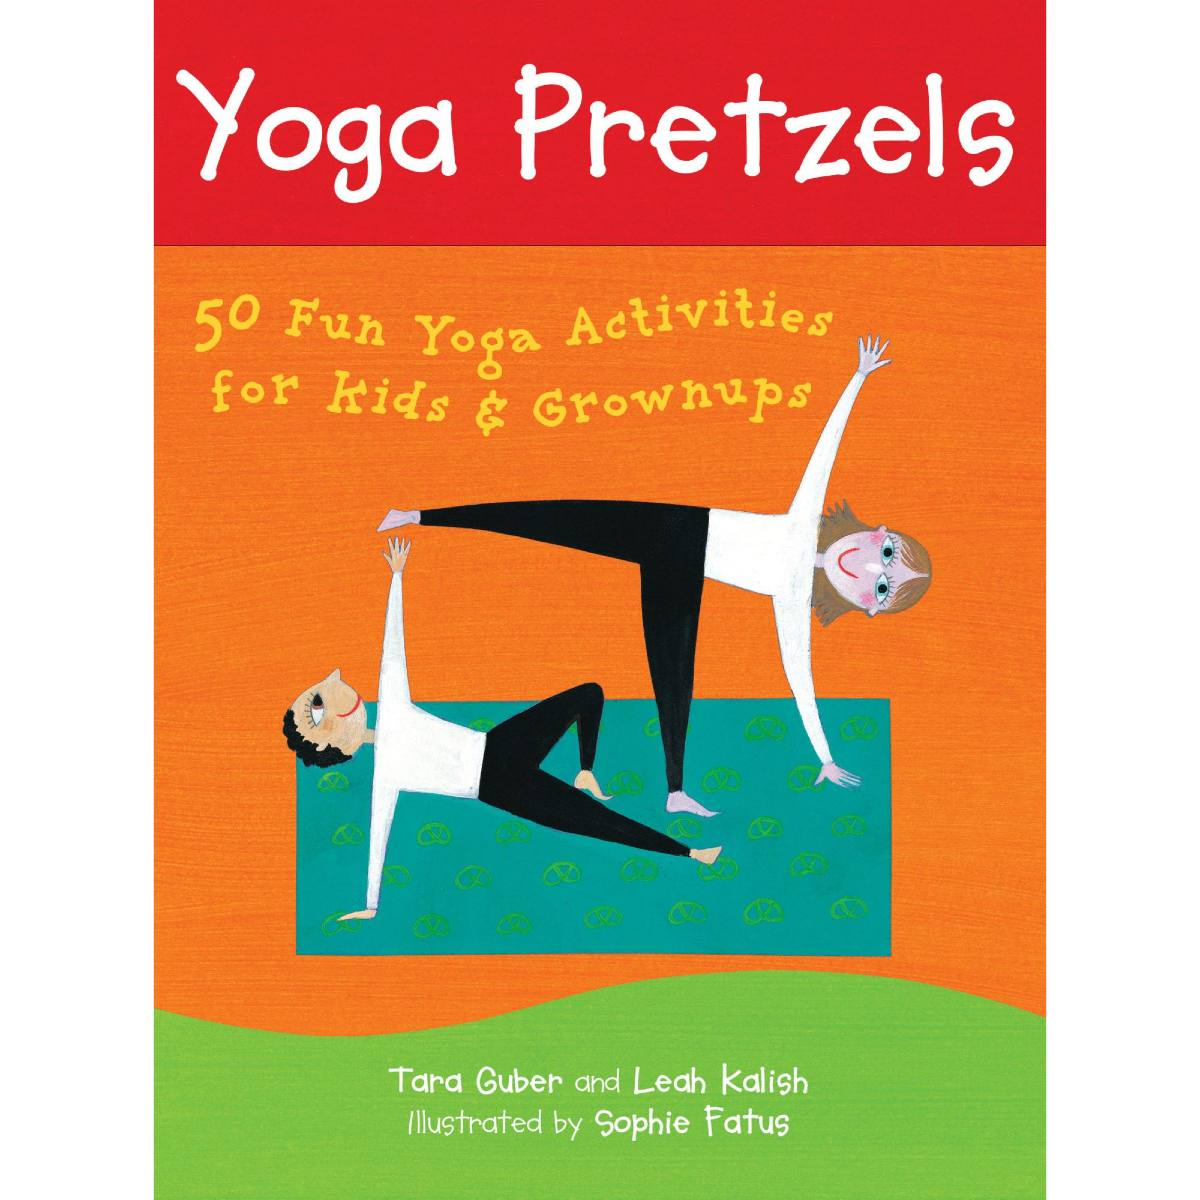 Yoga Pretzels by Barefoot Books | Restoration Yard